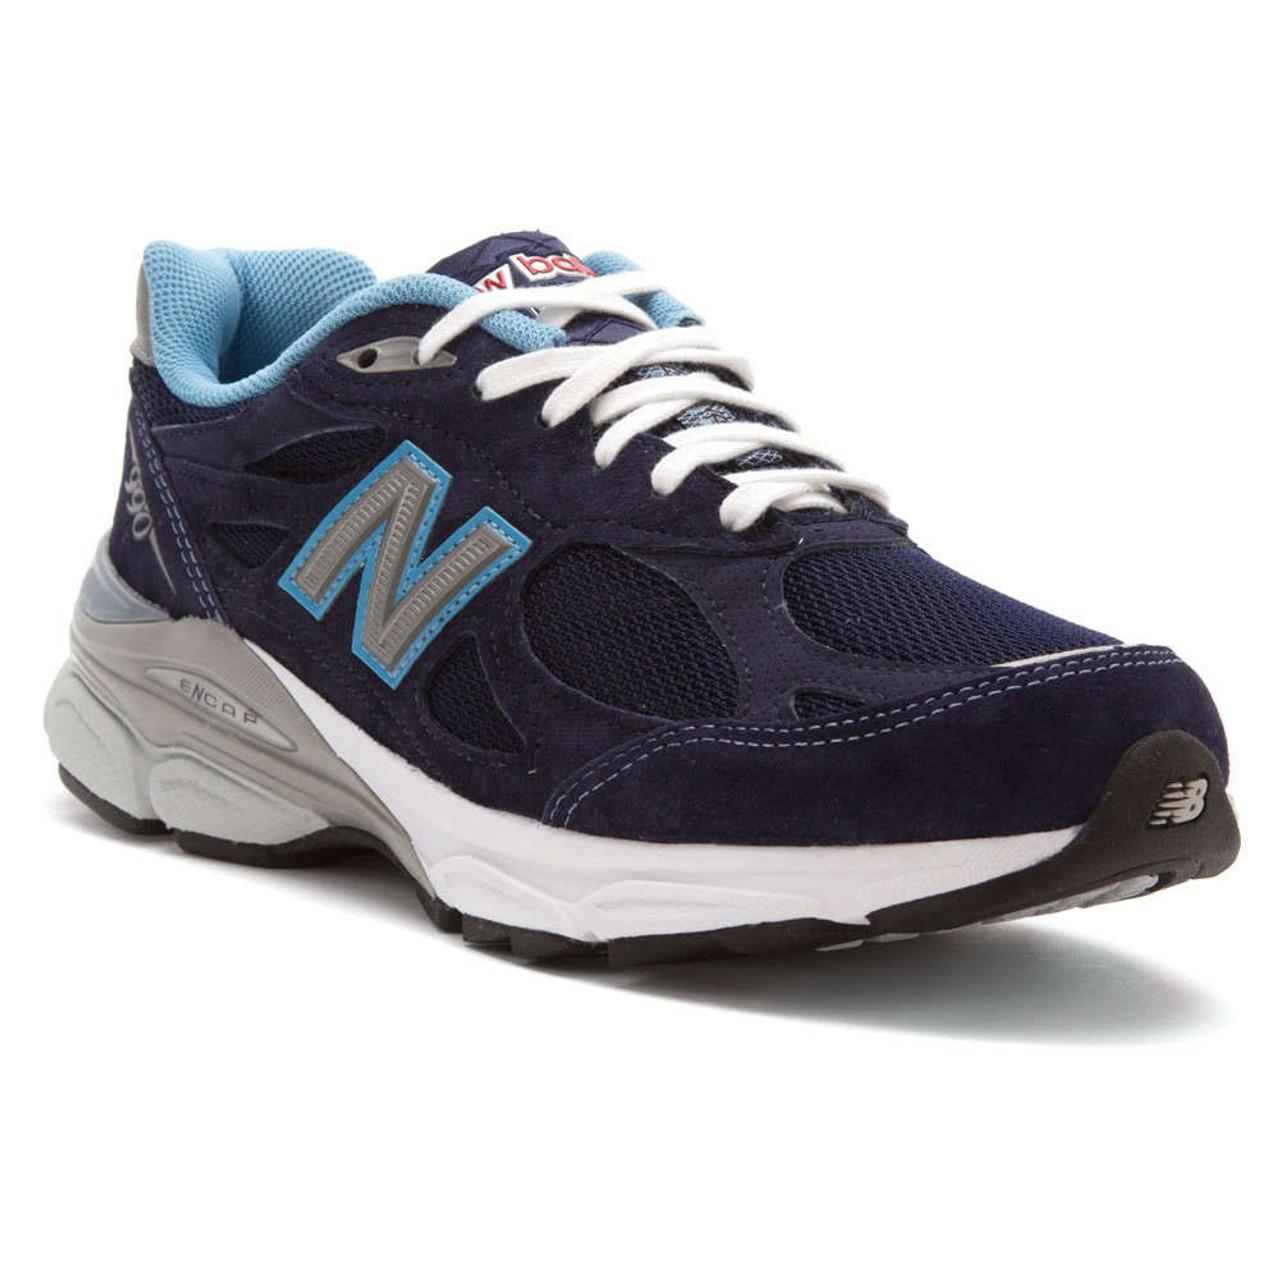 finest selection 109cd e9eb8 New Balance Women's W990NV3 Running Shoe Navy